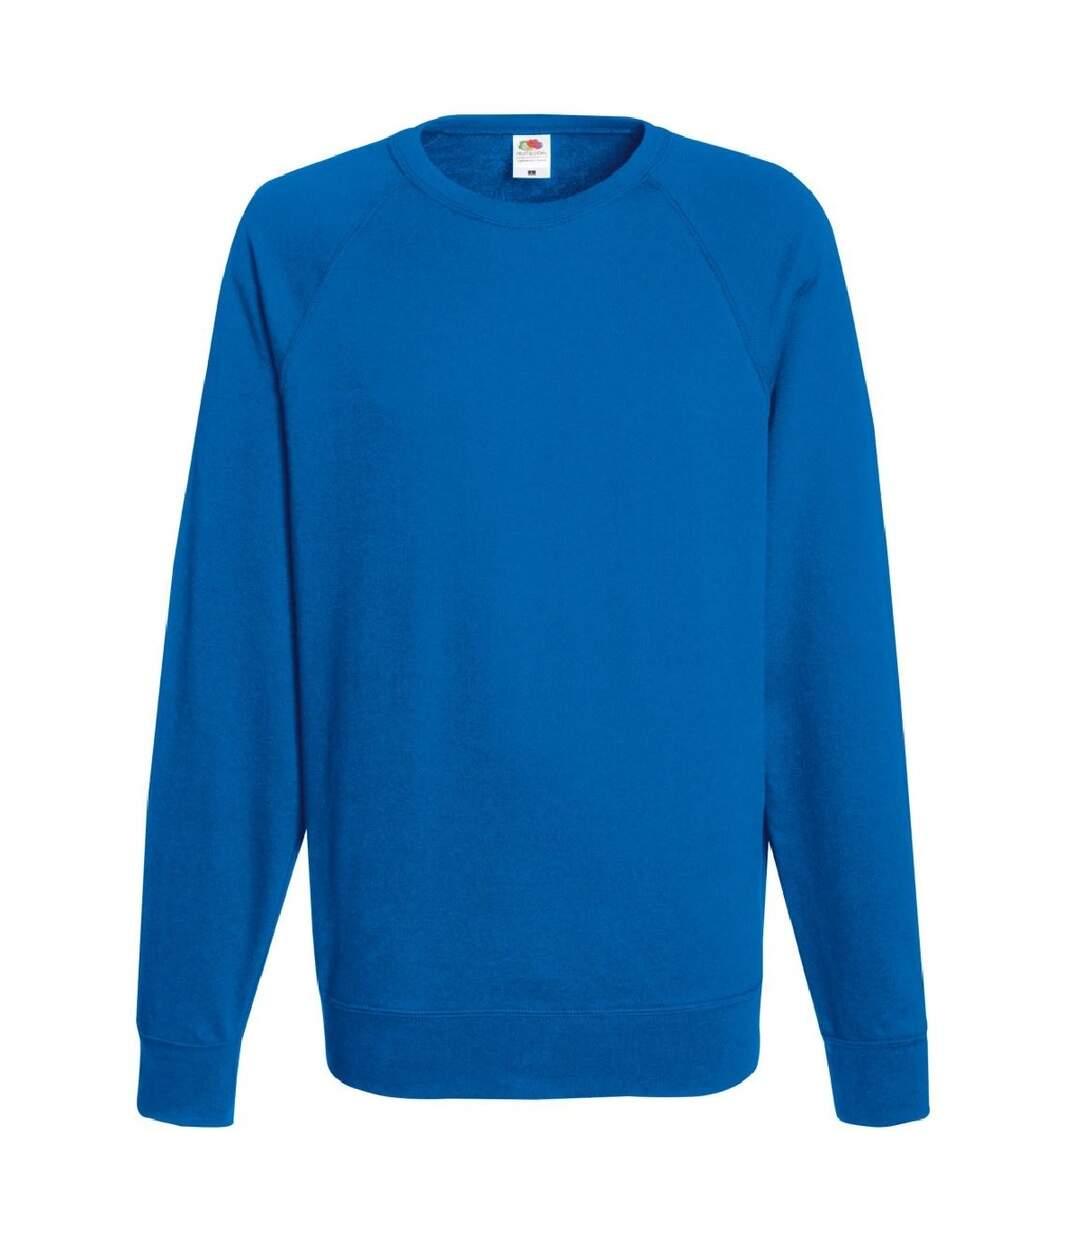 Fruit Of The Loom Mens Lightweight Raglan Sweatshirt (240 GSM) (Royal) - UTBC2653